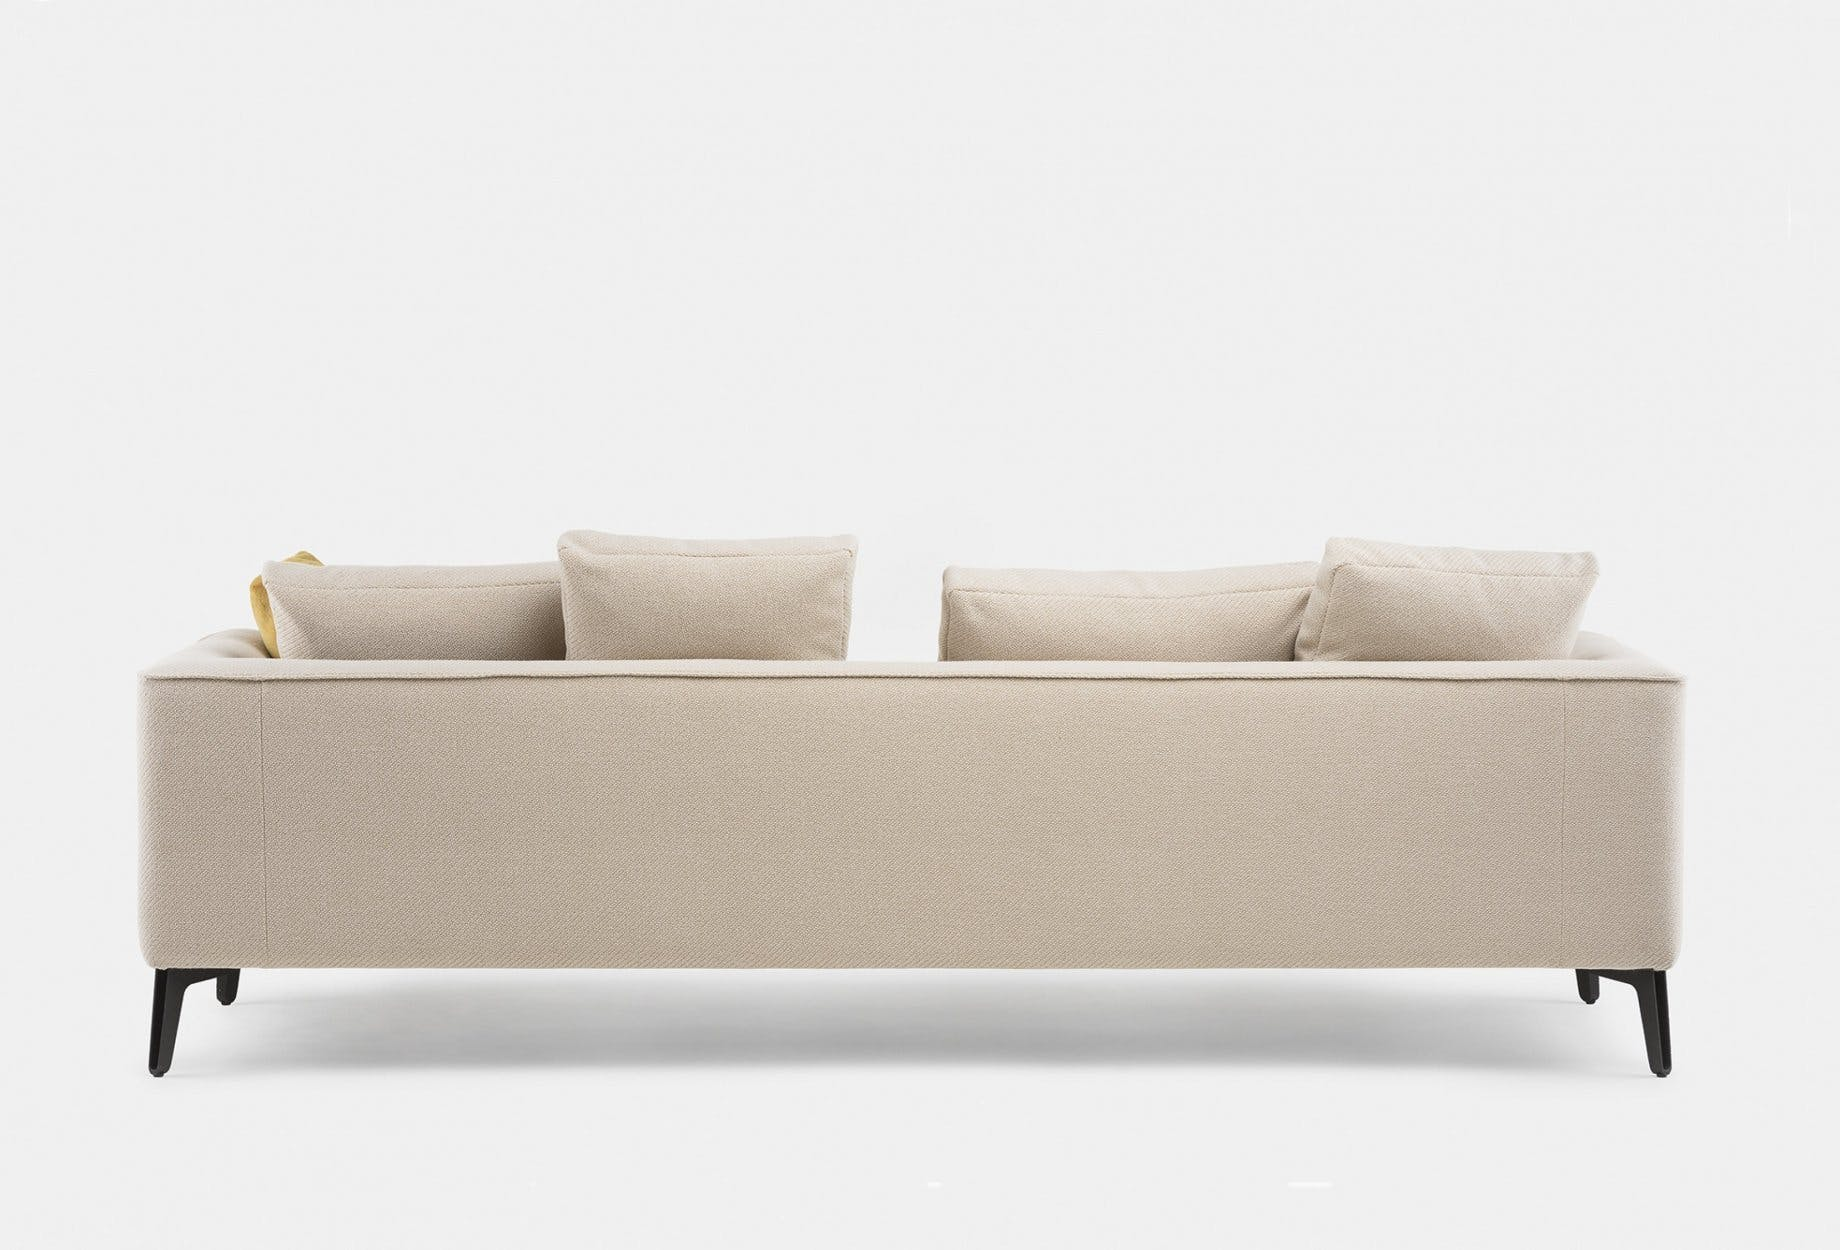 401 Mc Queen Sofa By Matthew Hilton In Coda 2 422 Fabric  Backweb 1840X1250